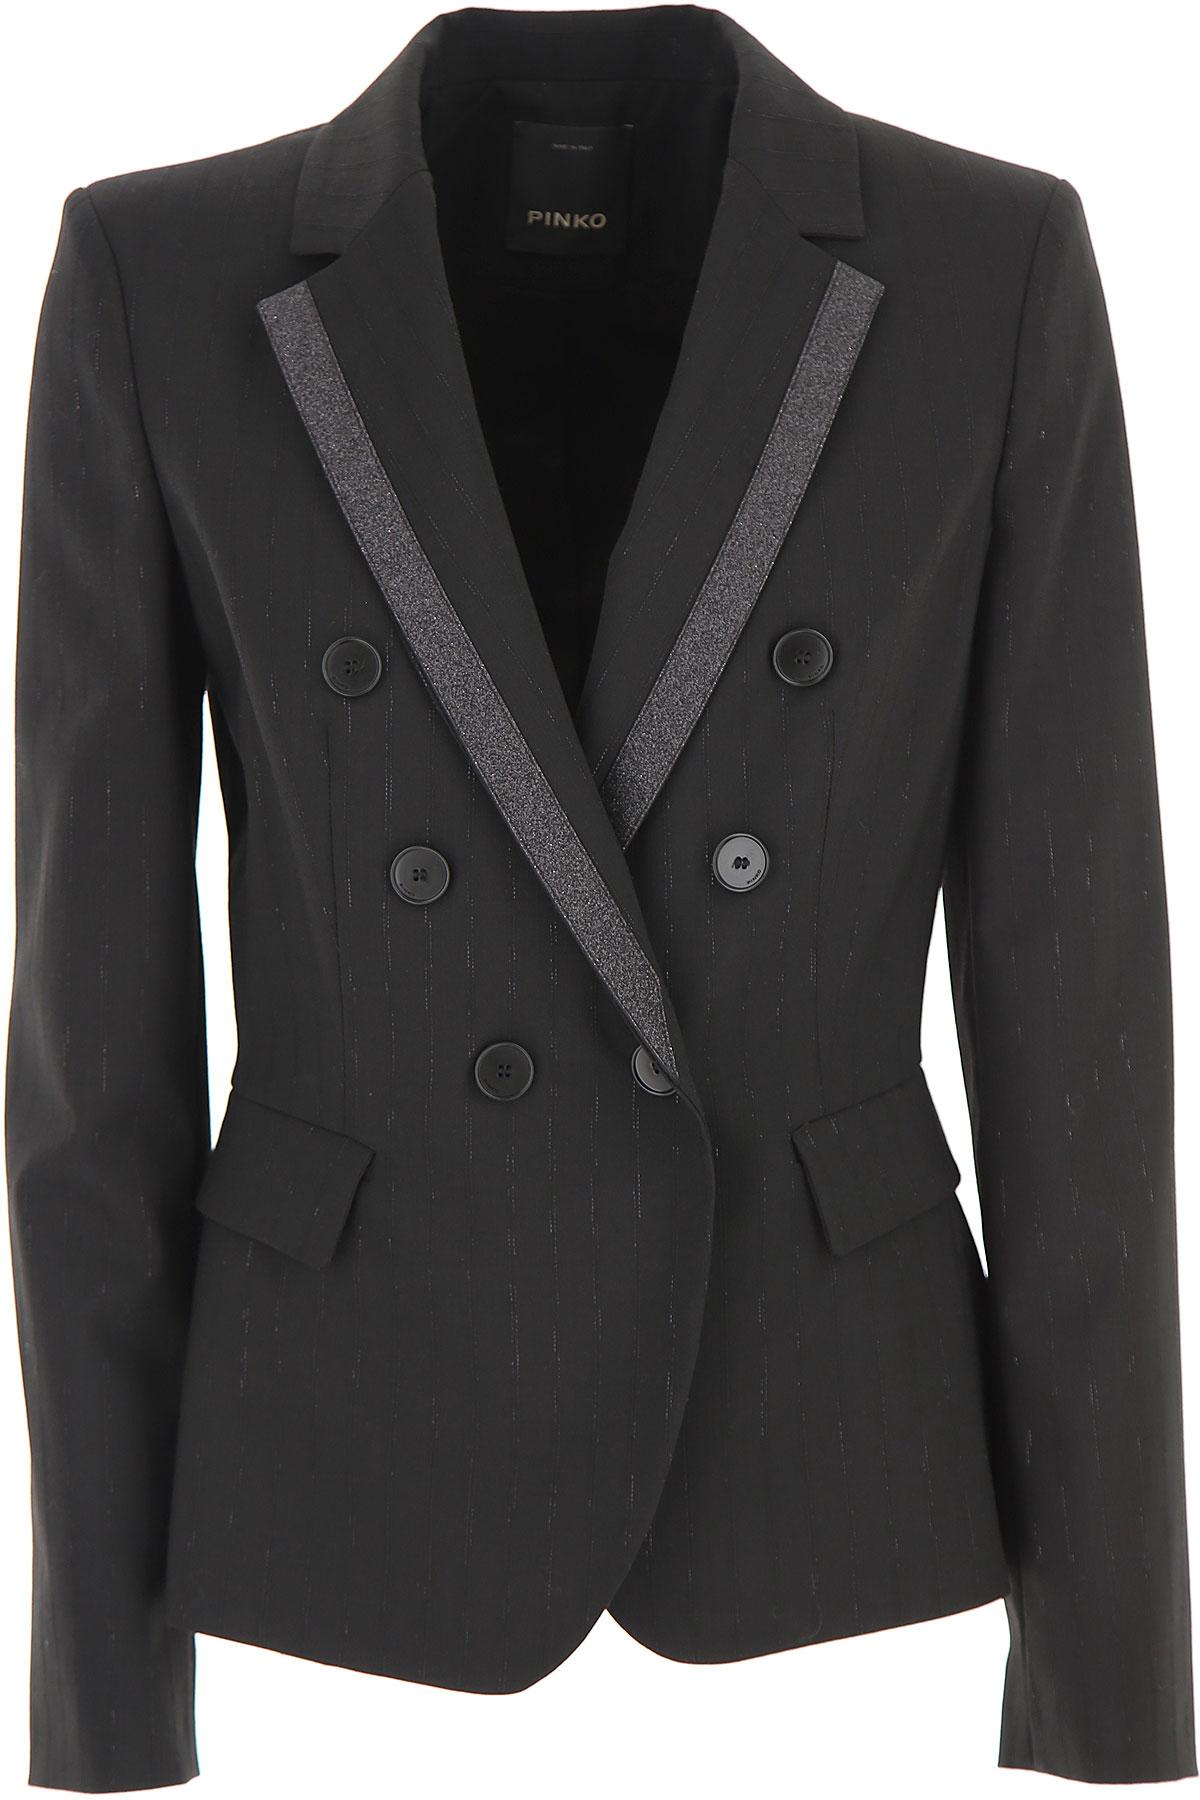 Pinko Blazer for Women On Sale, Black, polyester, 2019, 6 8